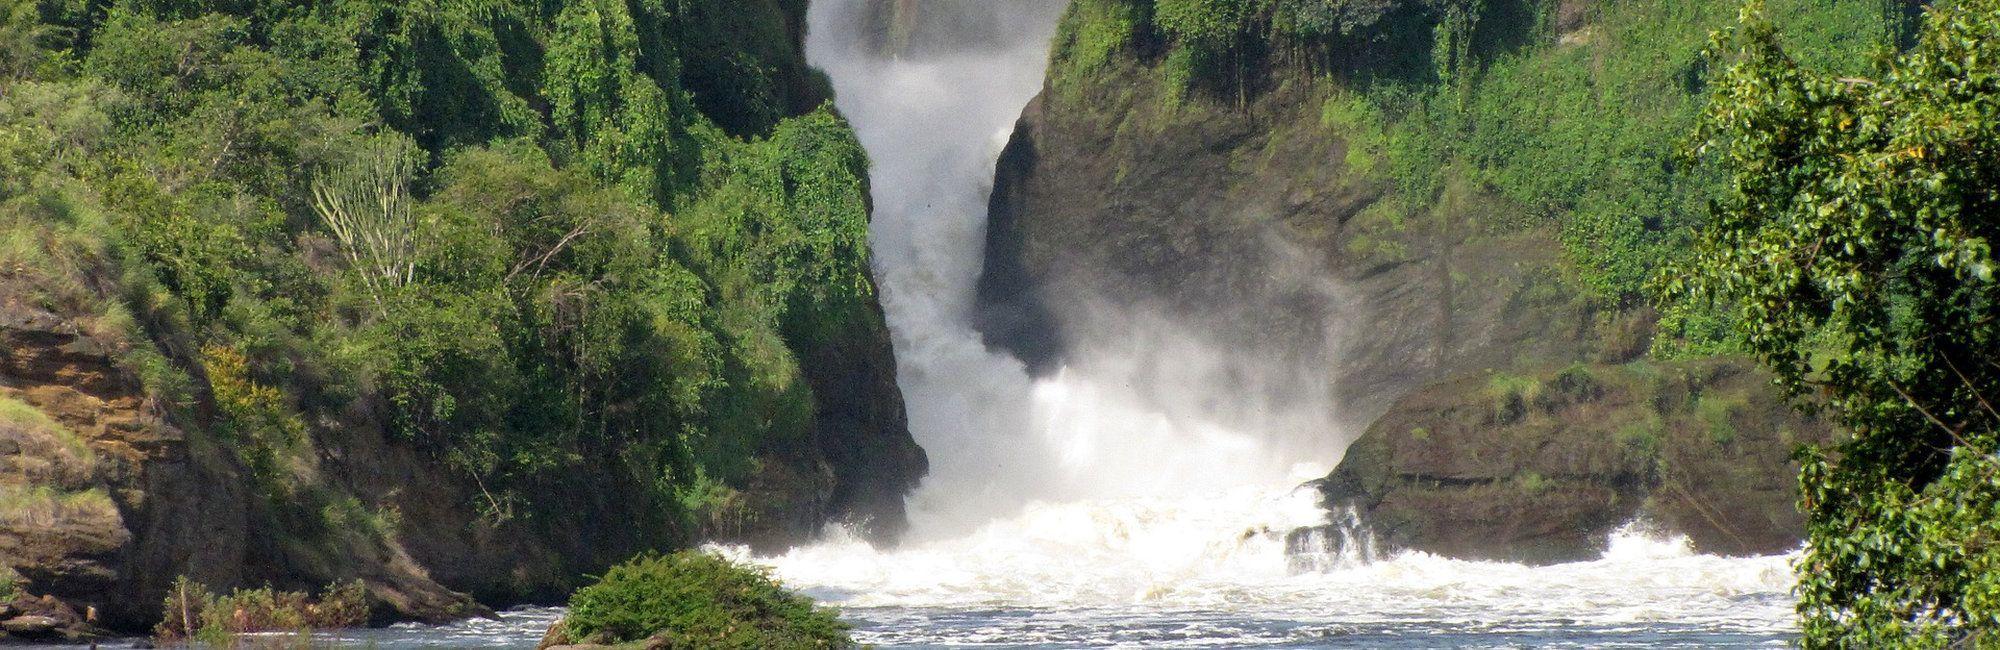 Oeganda Murchison Waterval